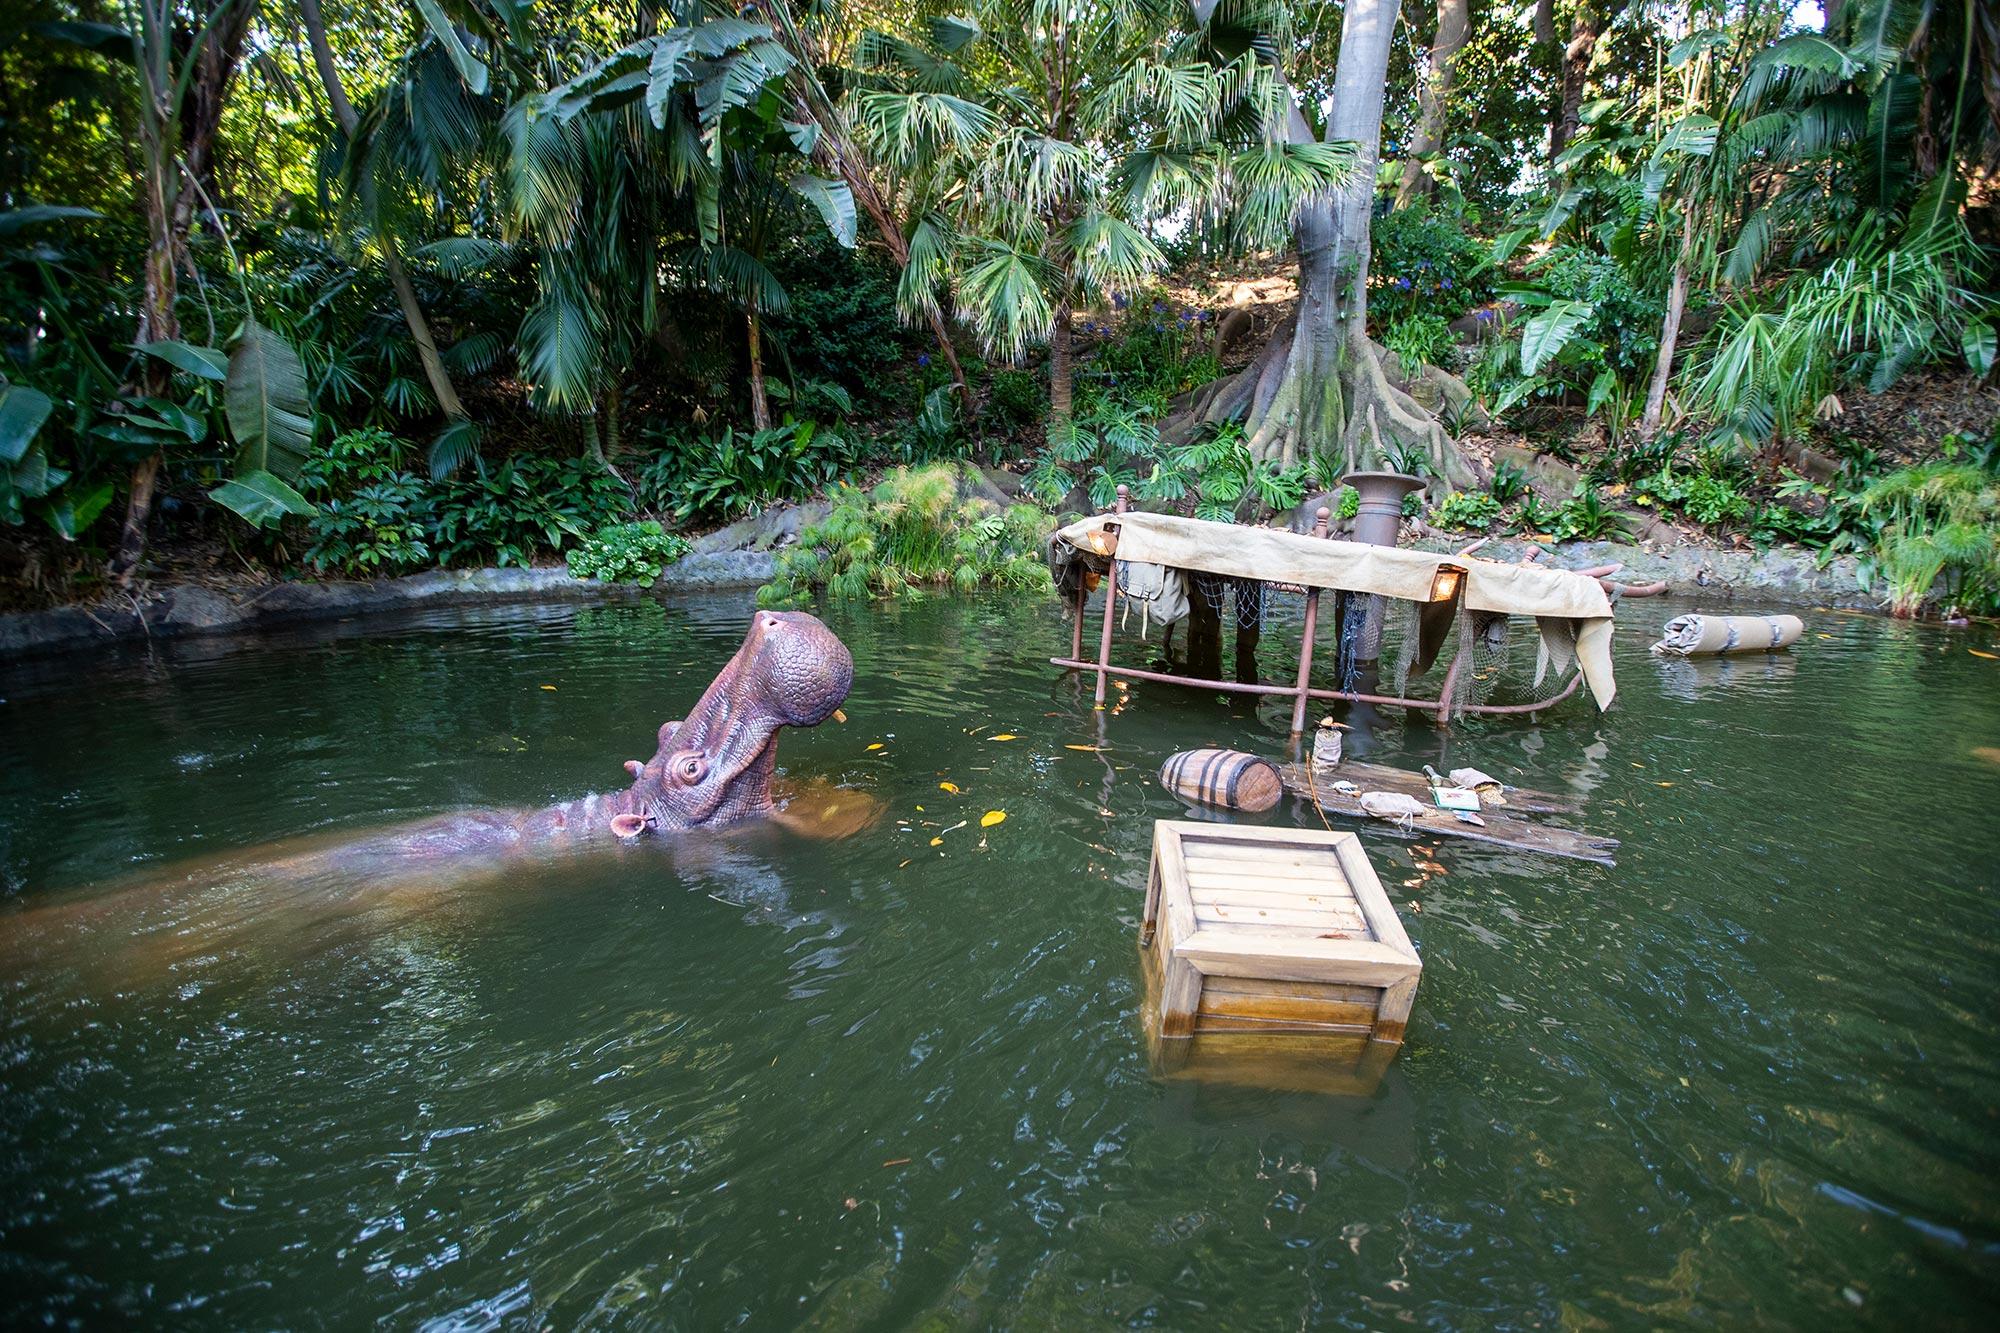 Disneyland's Jungle Cruise ride reopens